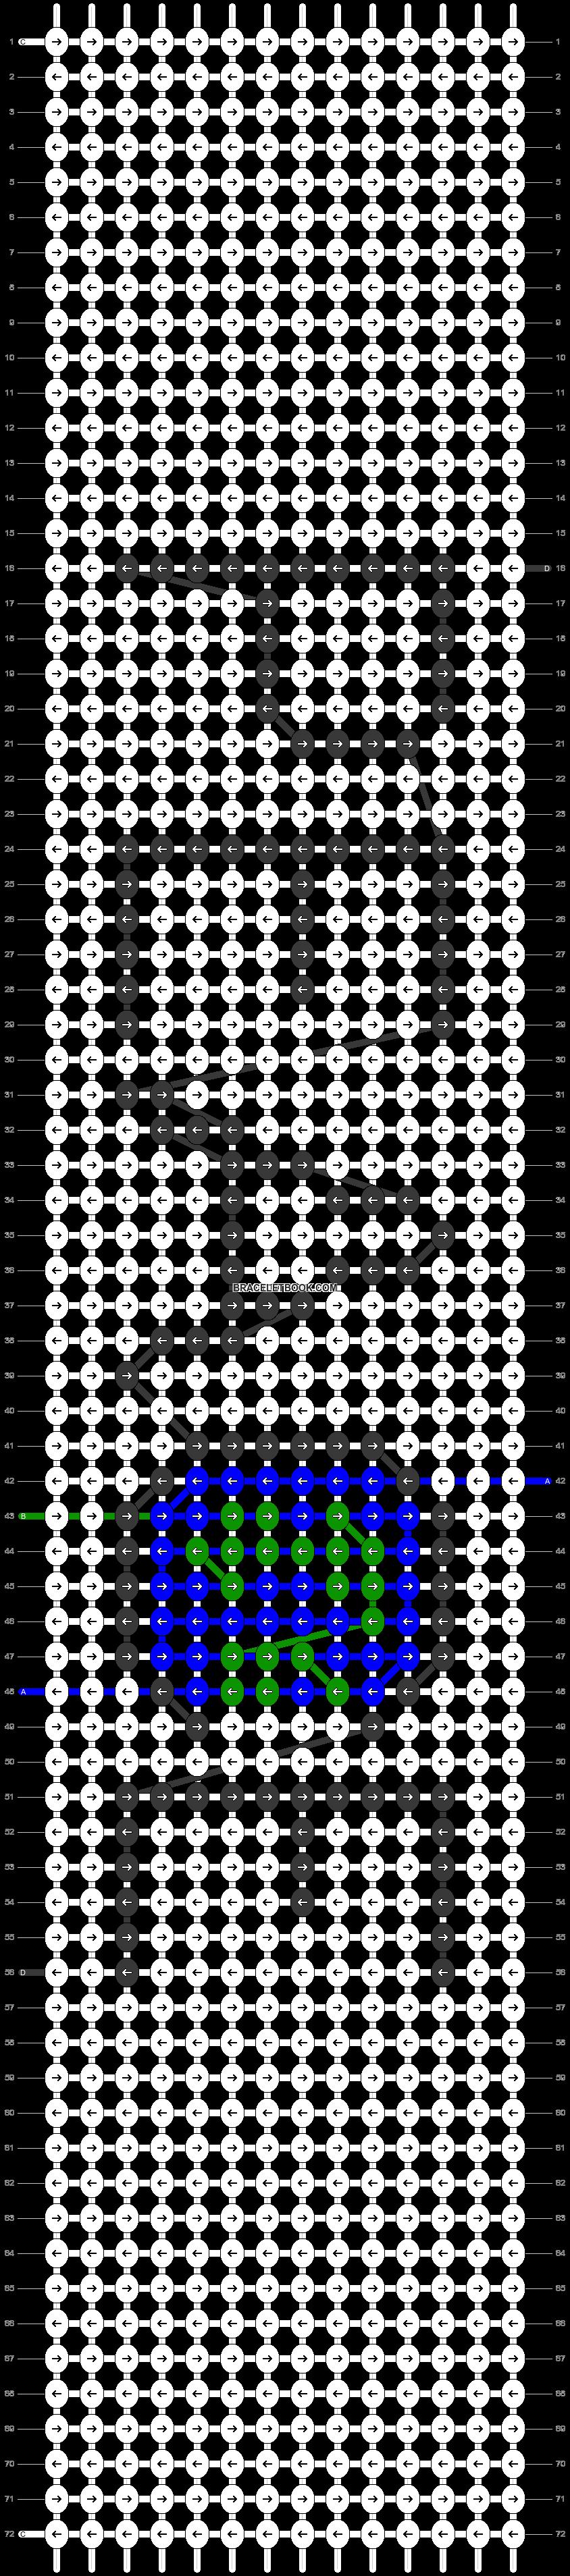 Alpha pattern #30293 pattern